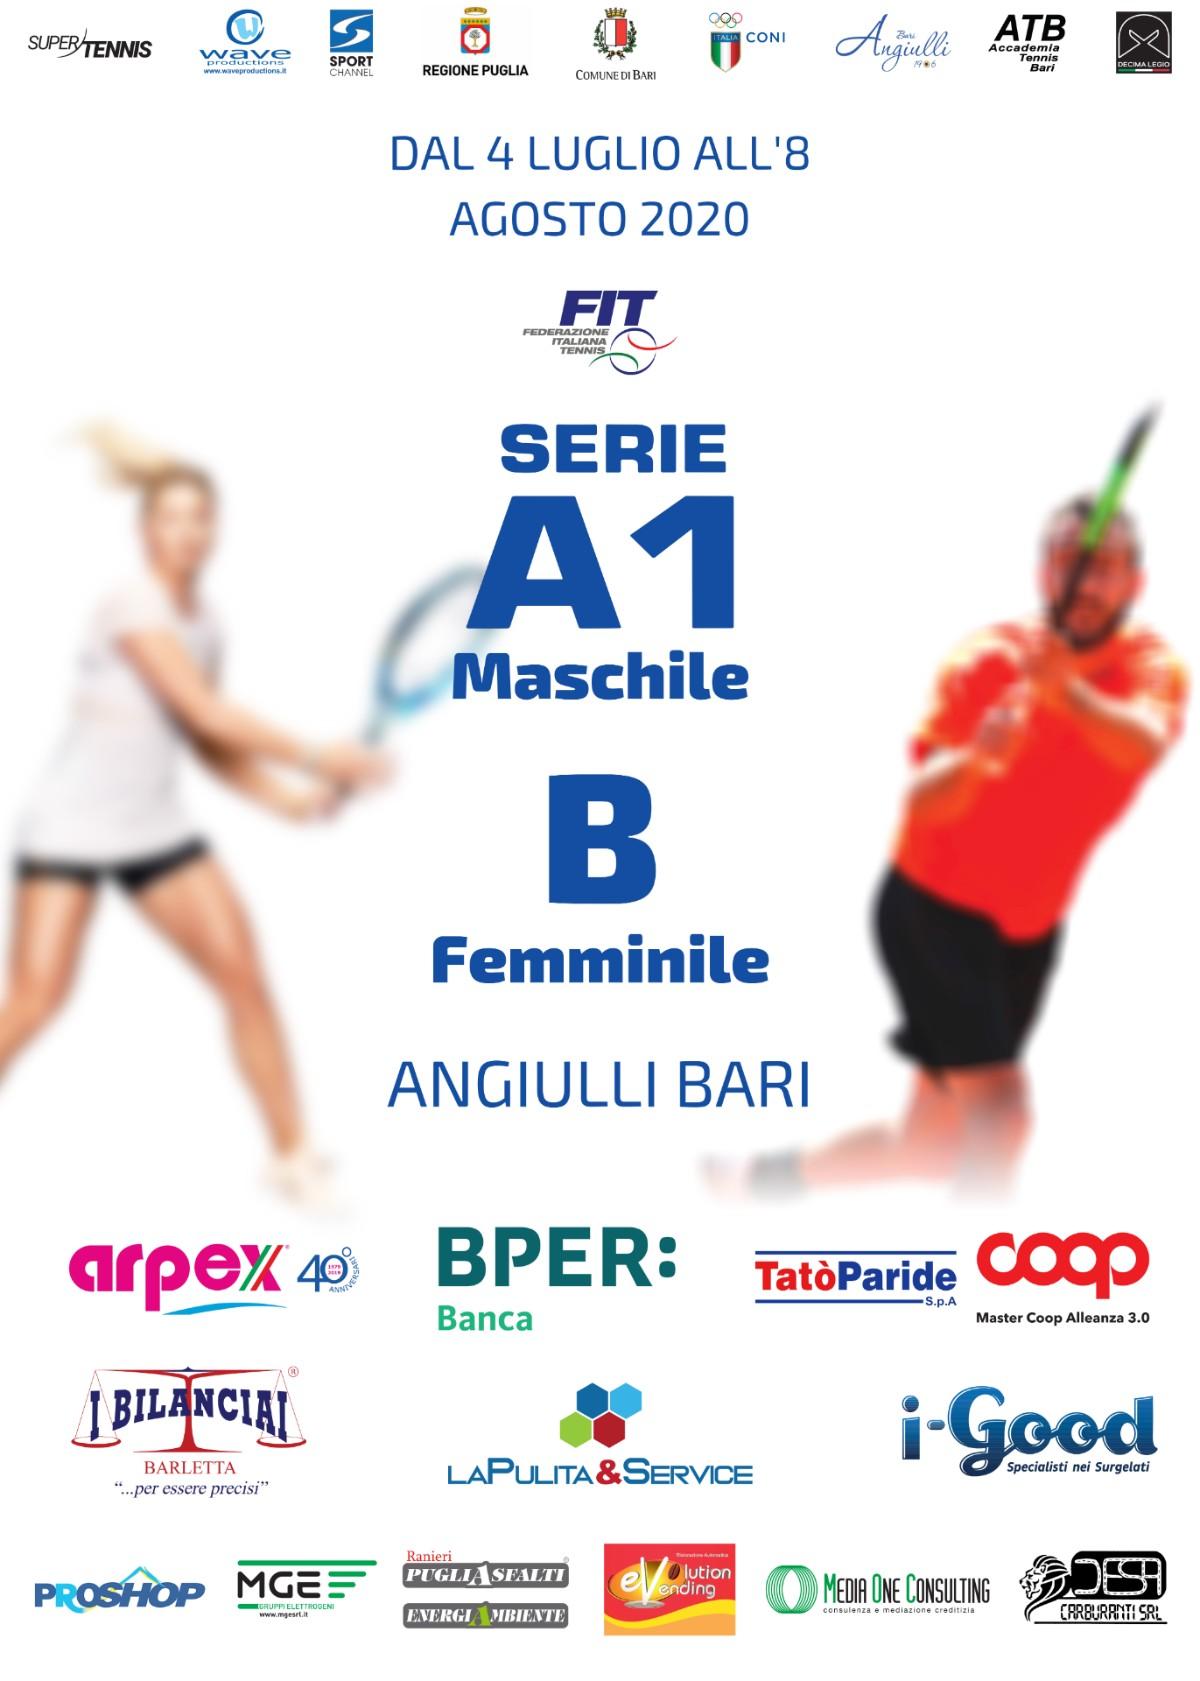 La Pulita Sponsor Seria A tennistica